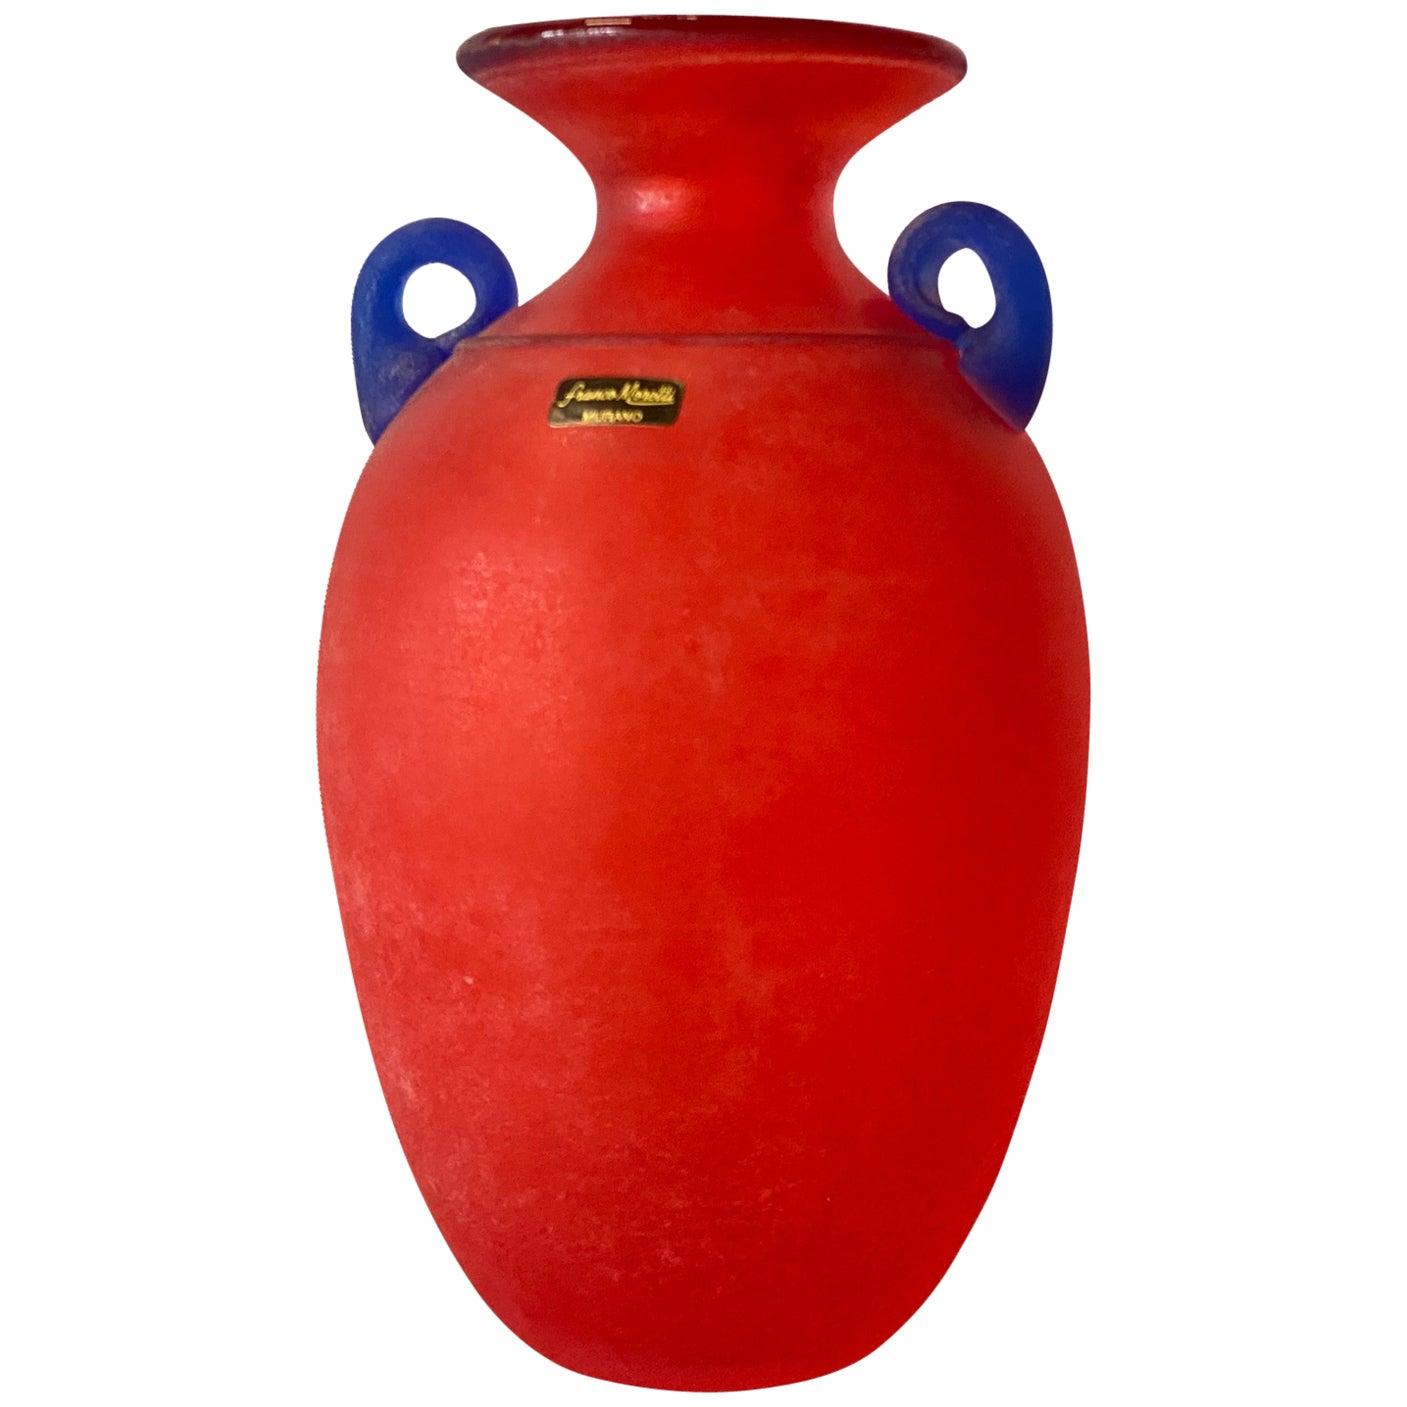 Murano Glass Vase by Franco Moretti, Italy, 1980s